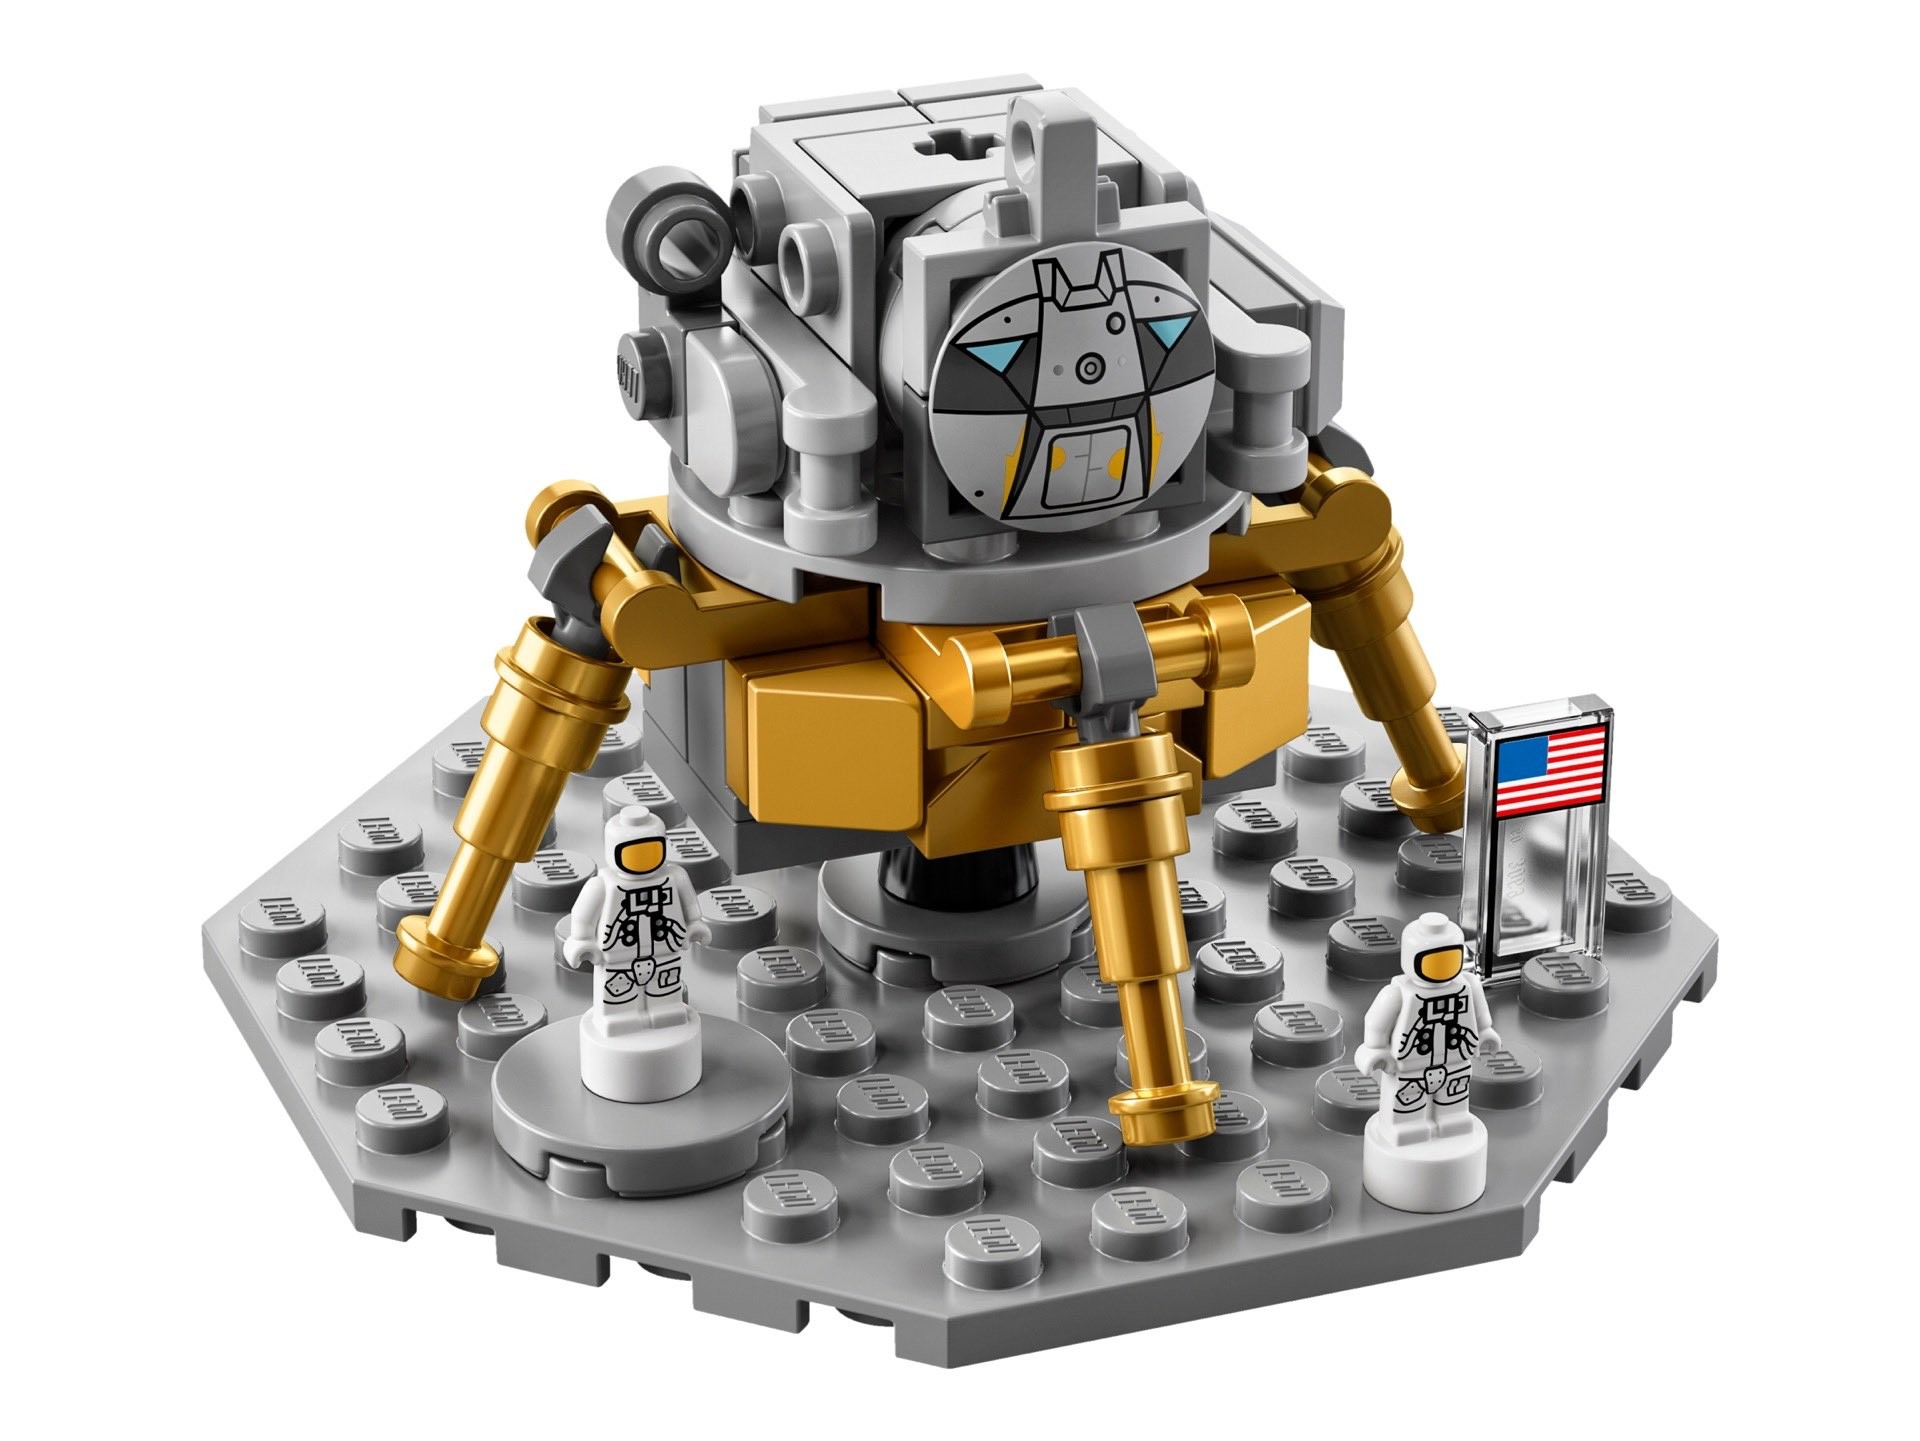 lego-ideas-nasa-apollo-saturn-v-set-moon-lander